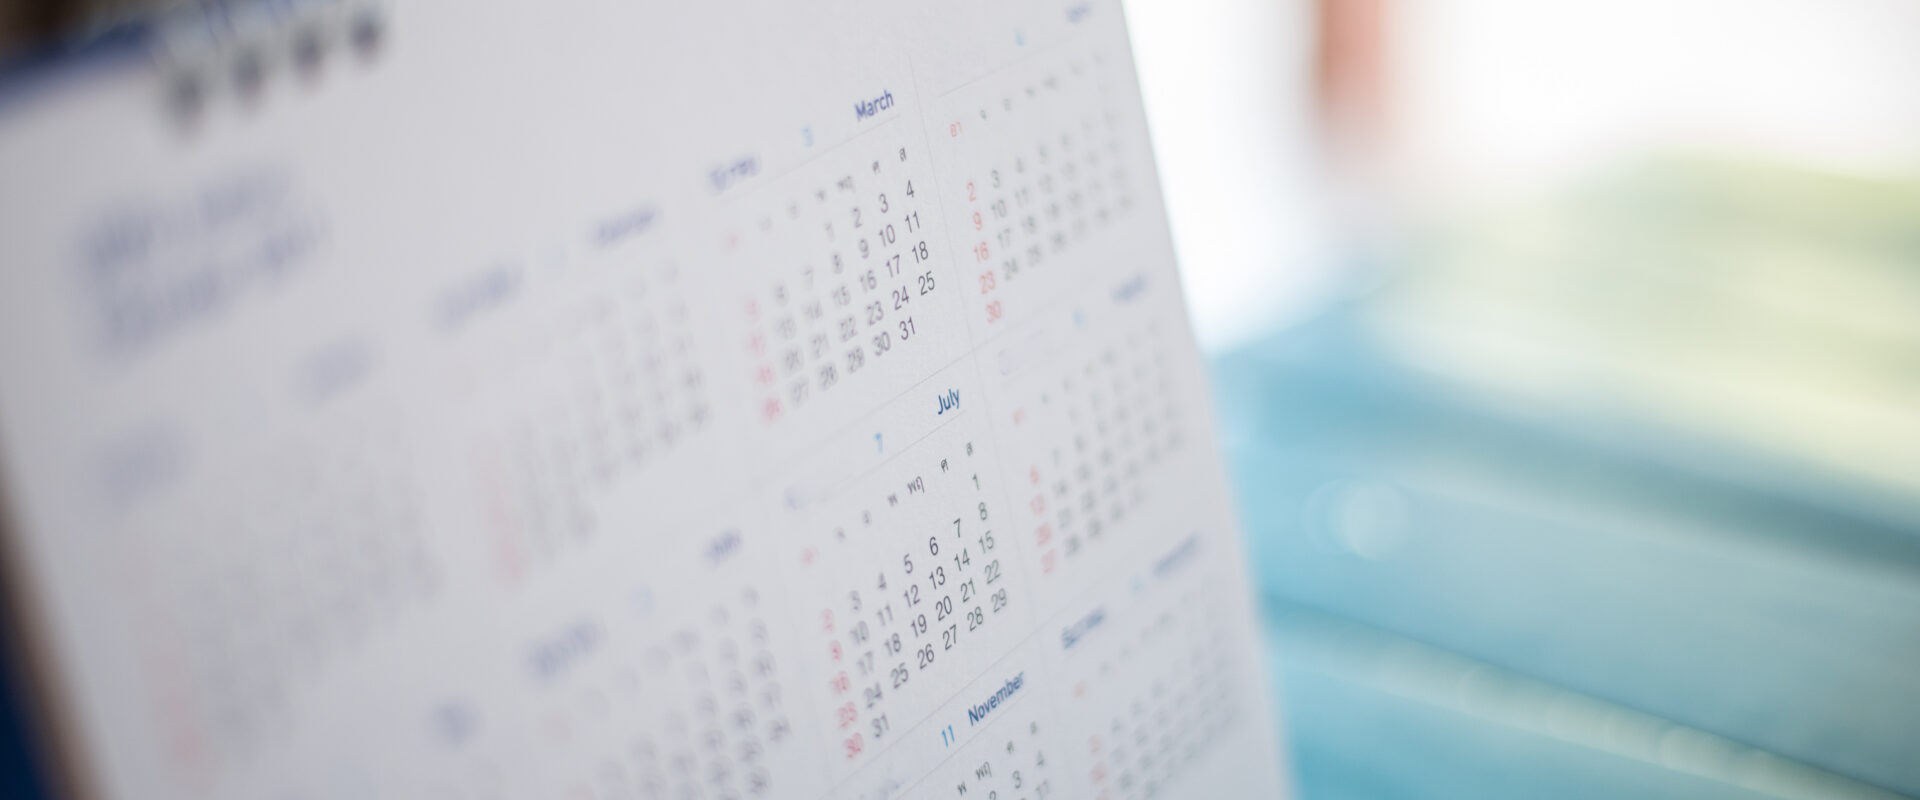 Kalender L1nda